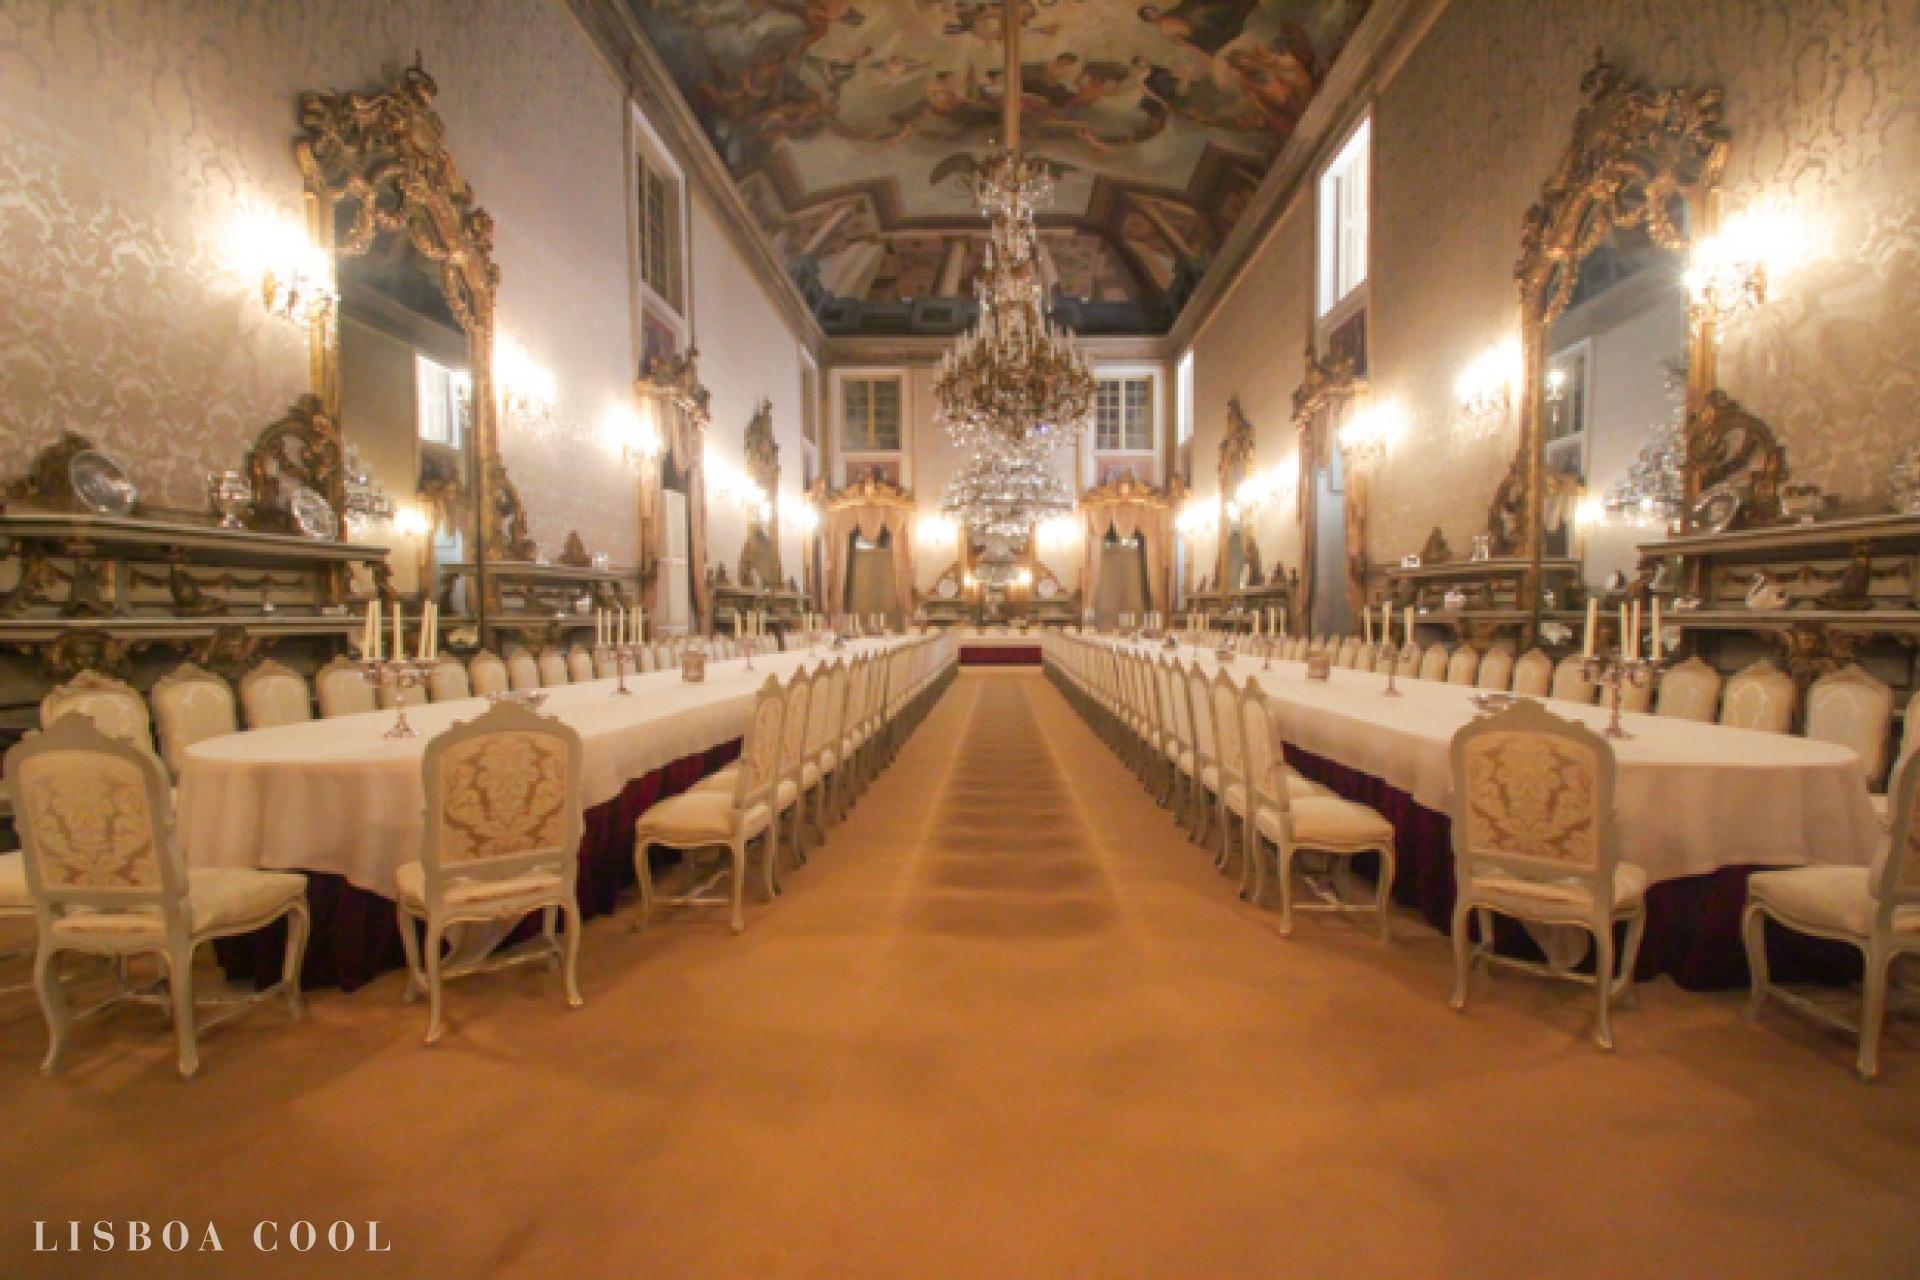 LisboaCool_Visitar_Palácio Nacional da Ajuda